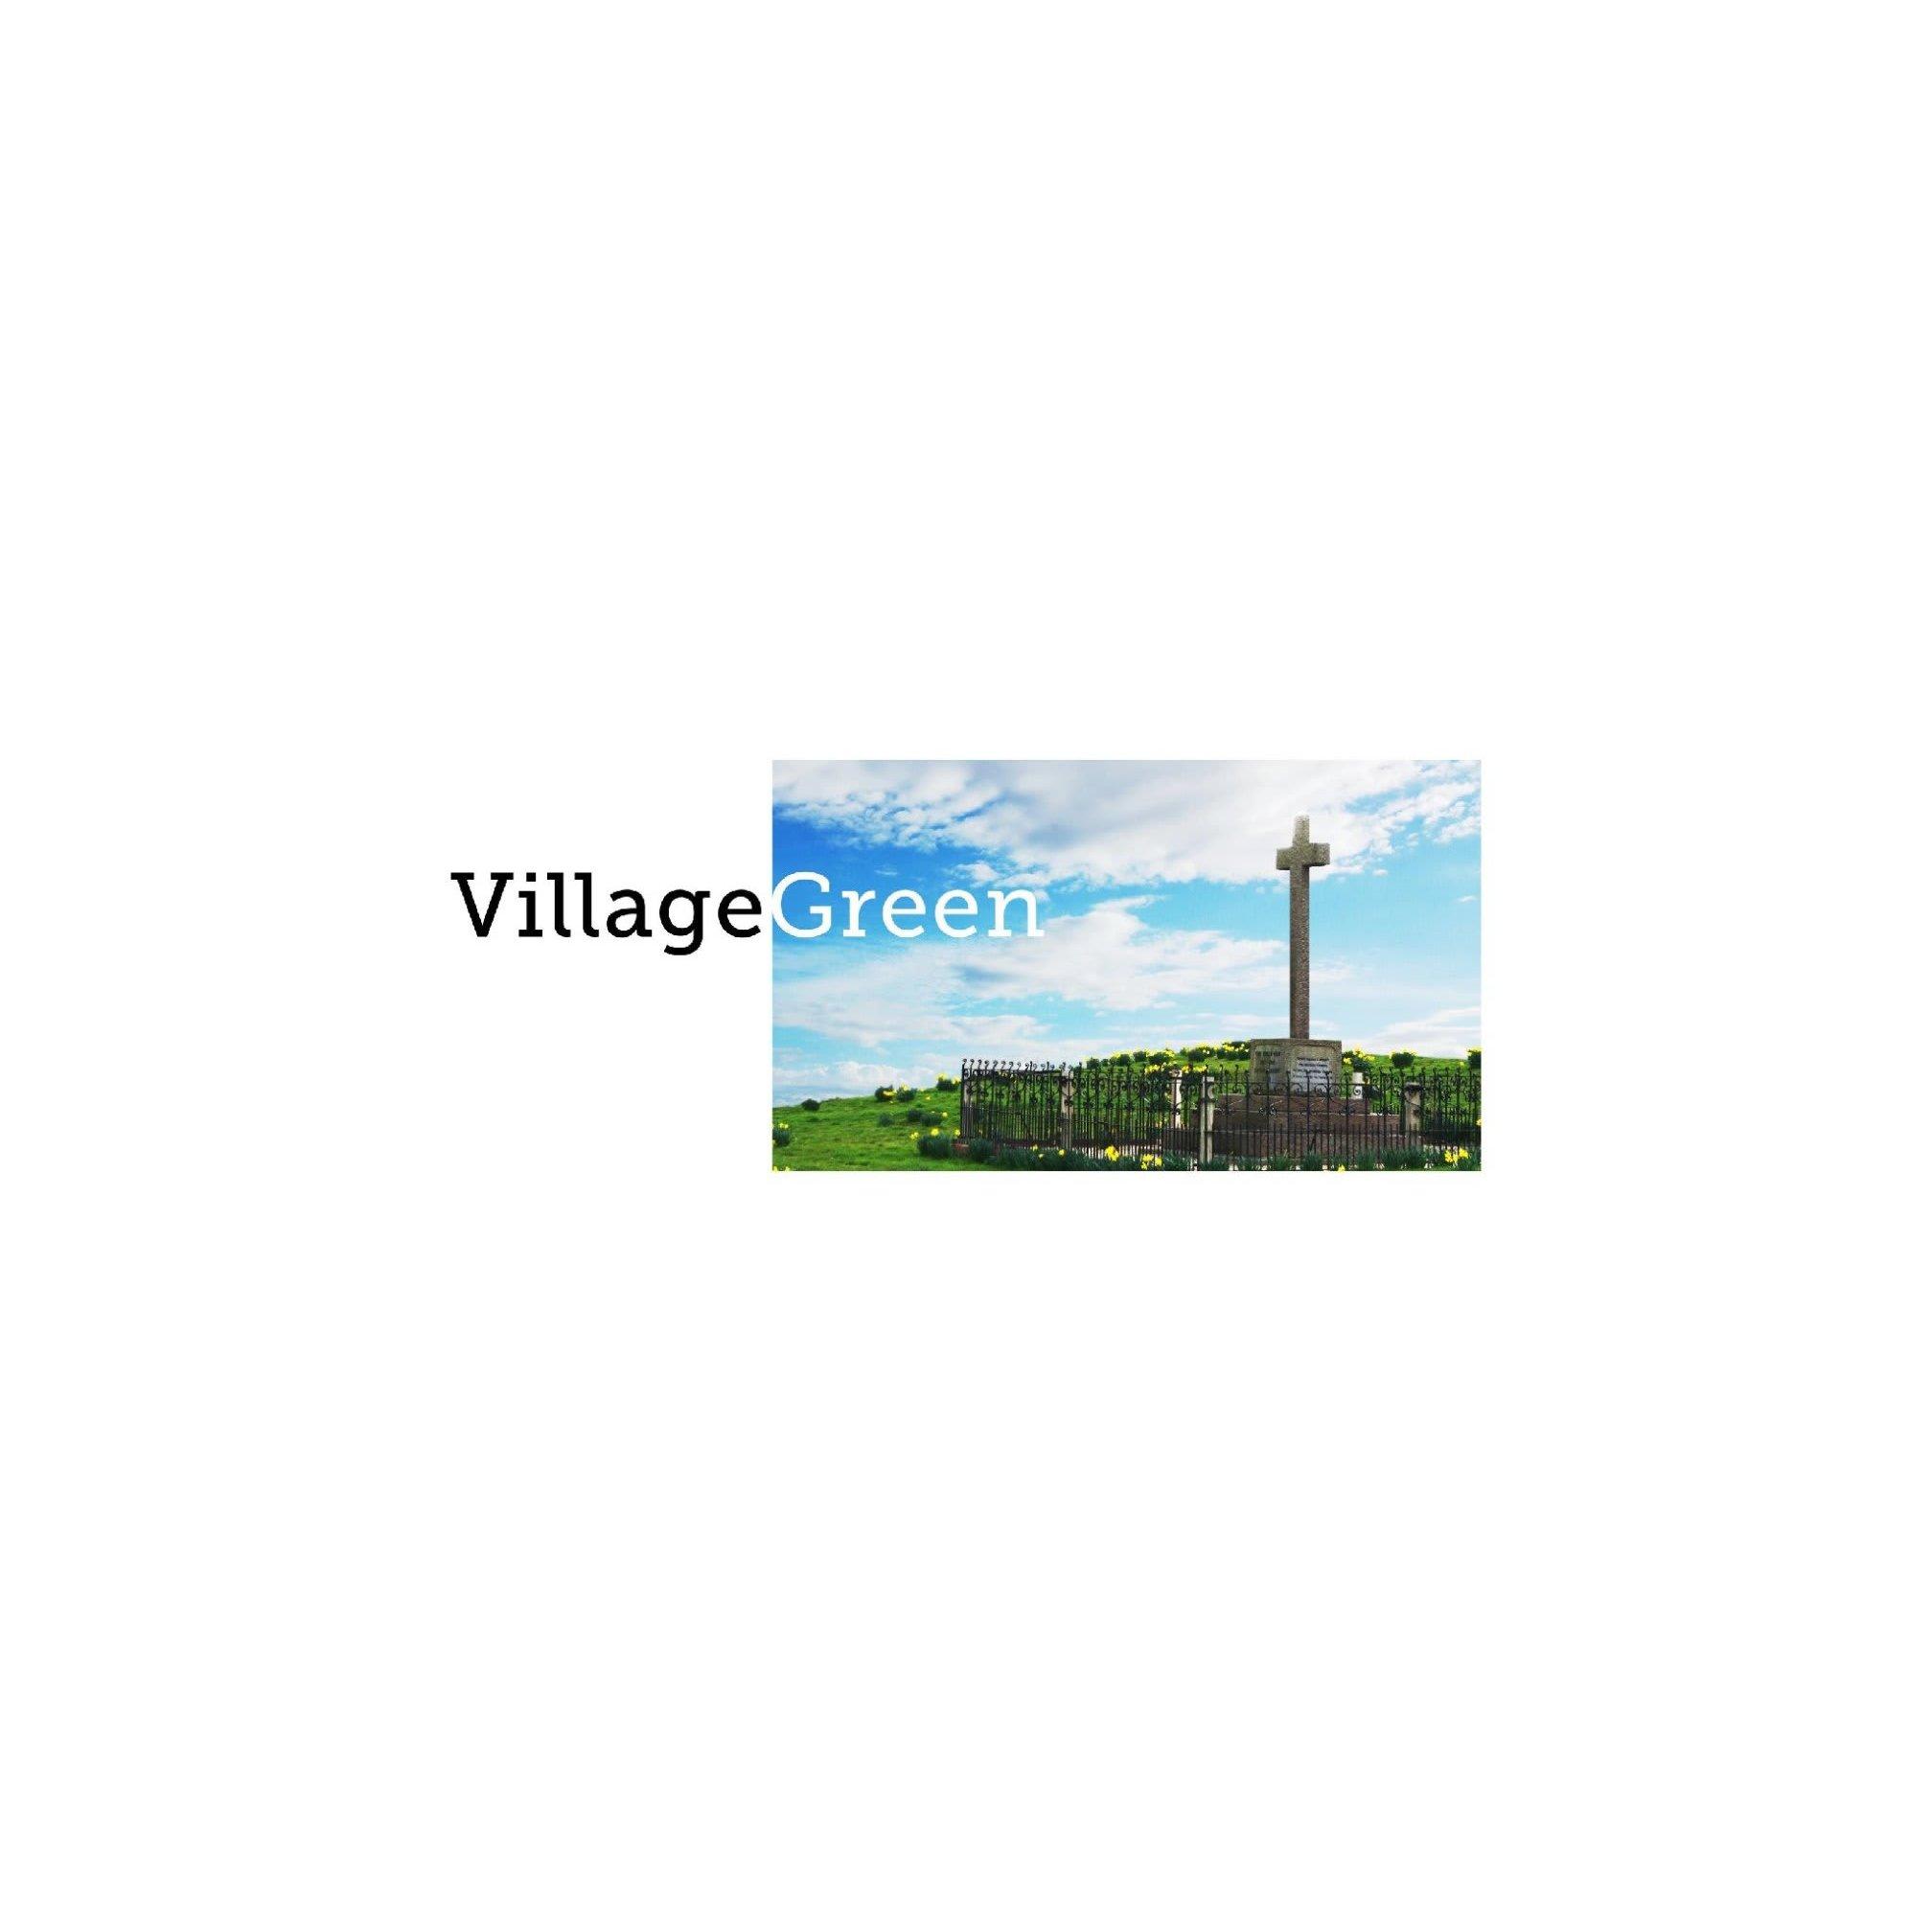 Village Green Wholesale Ltd - Melton Mowbray, Leicestershire LE14 2RE - 01664 454244 | ShowMeLocal.com